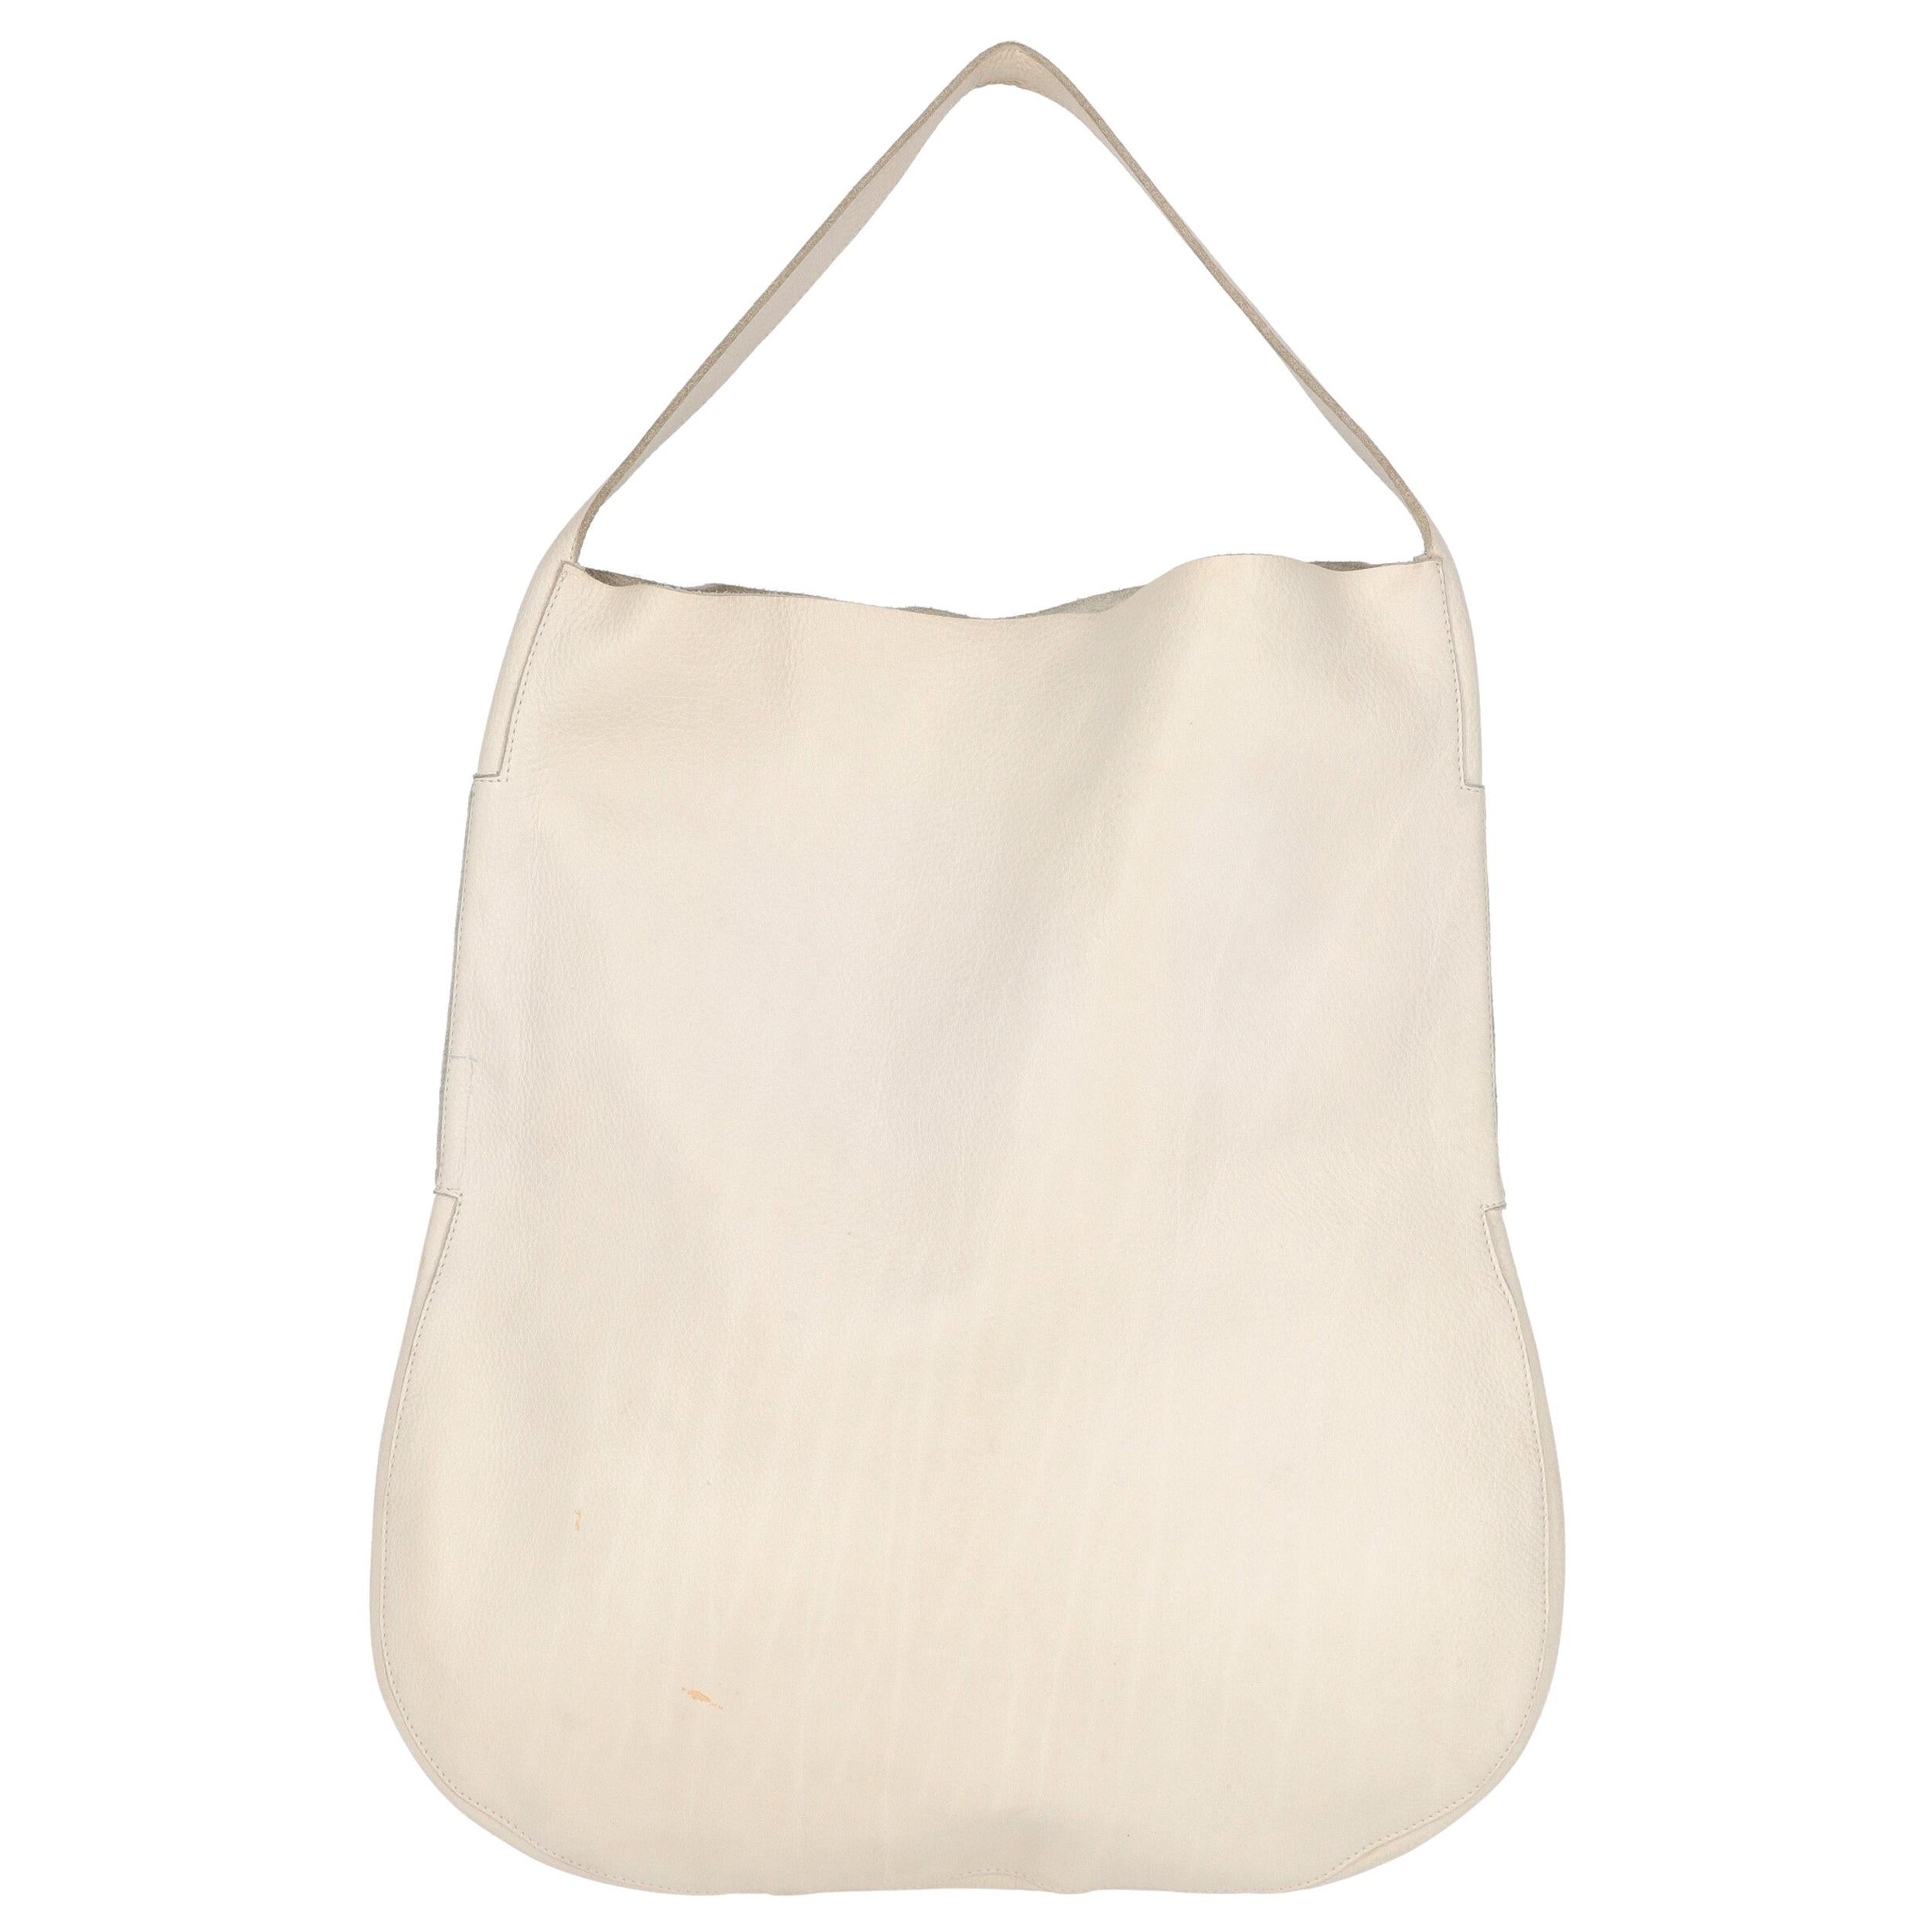 2000s Marni Leather Tote Bag